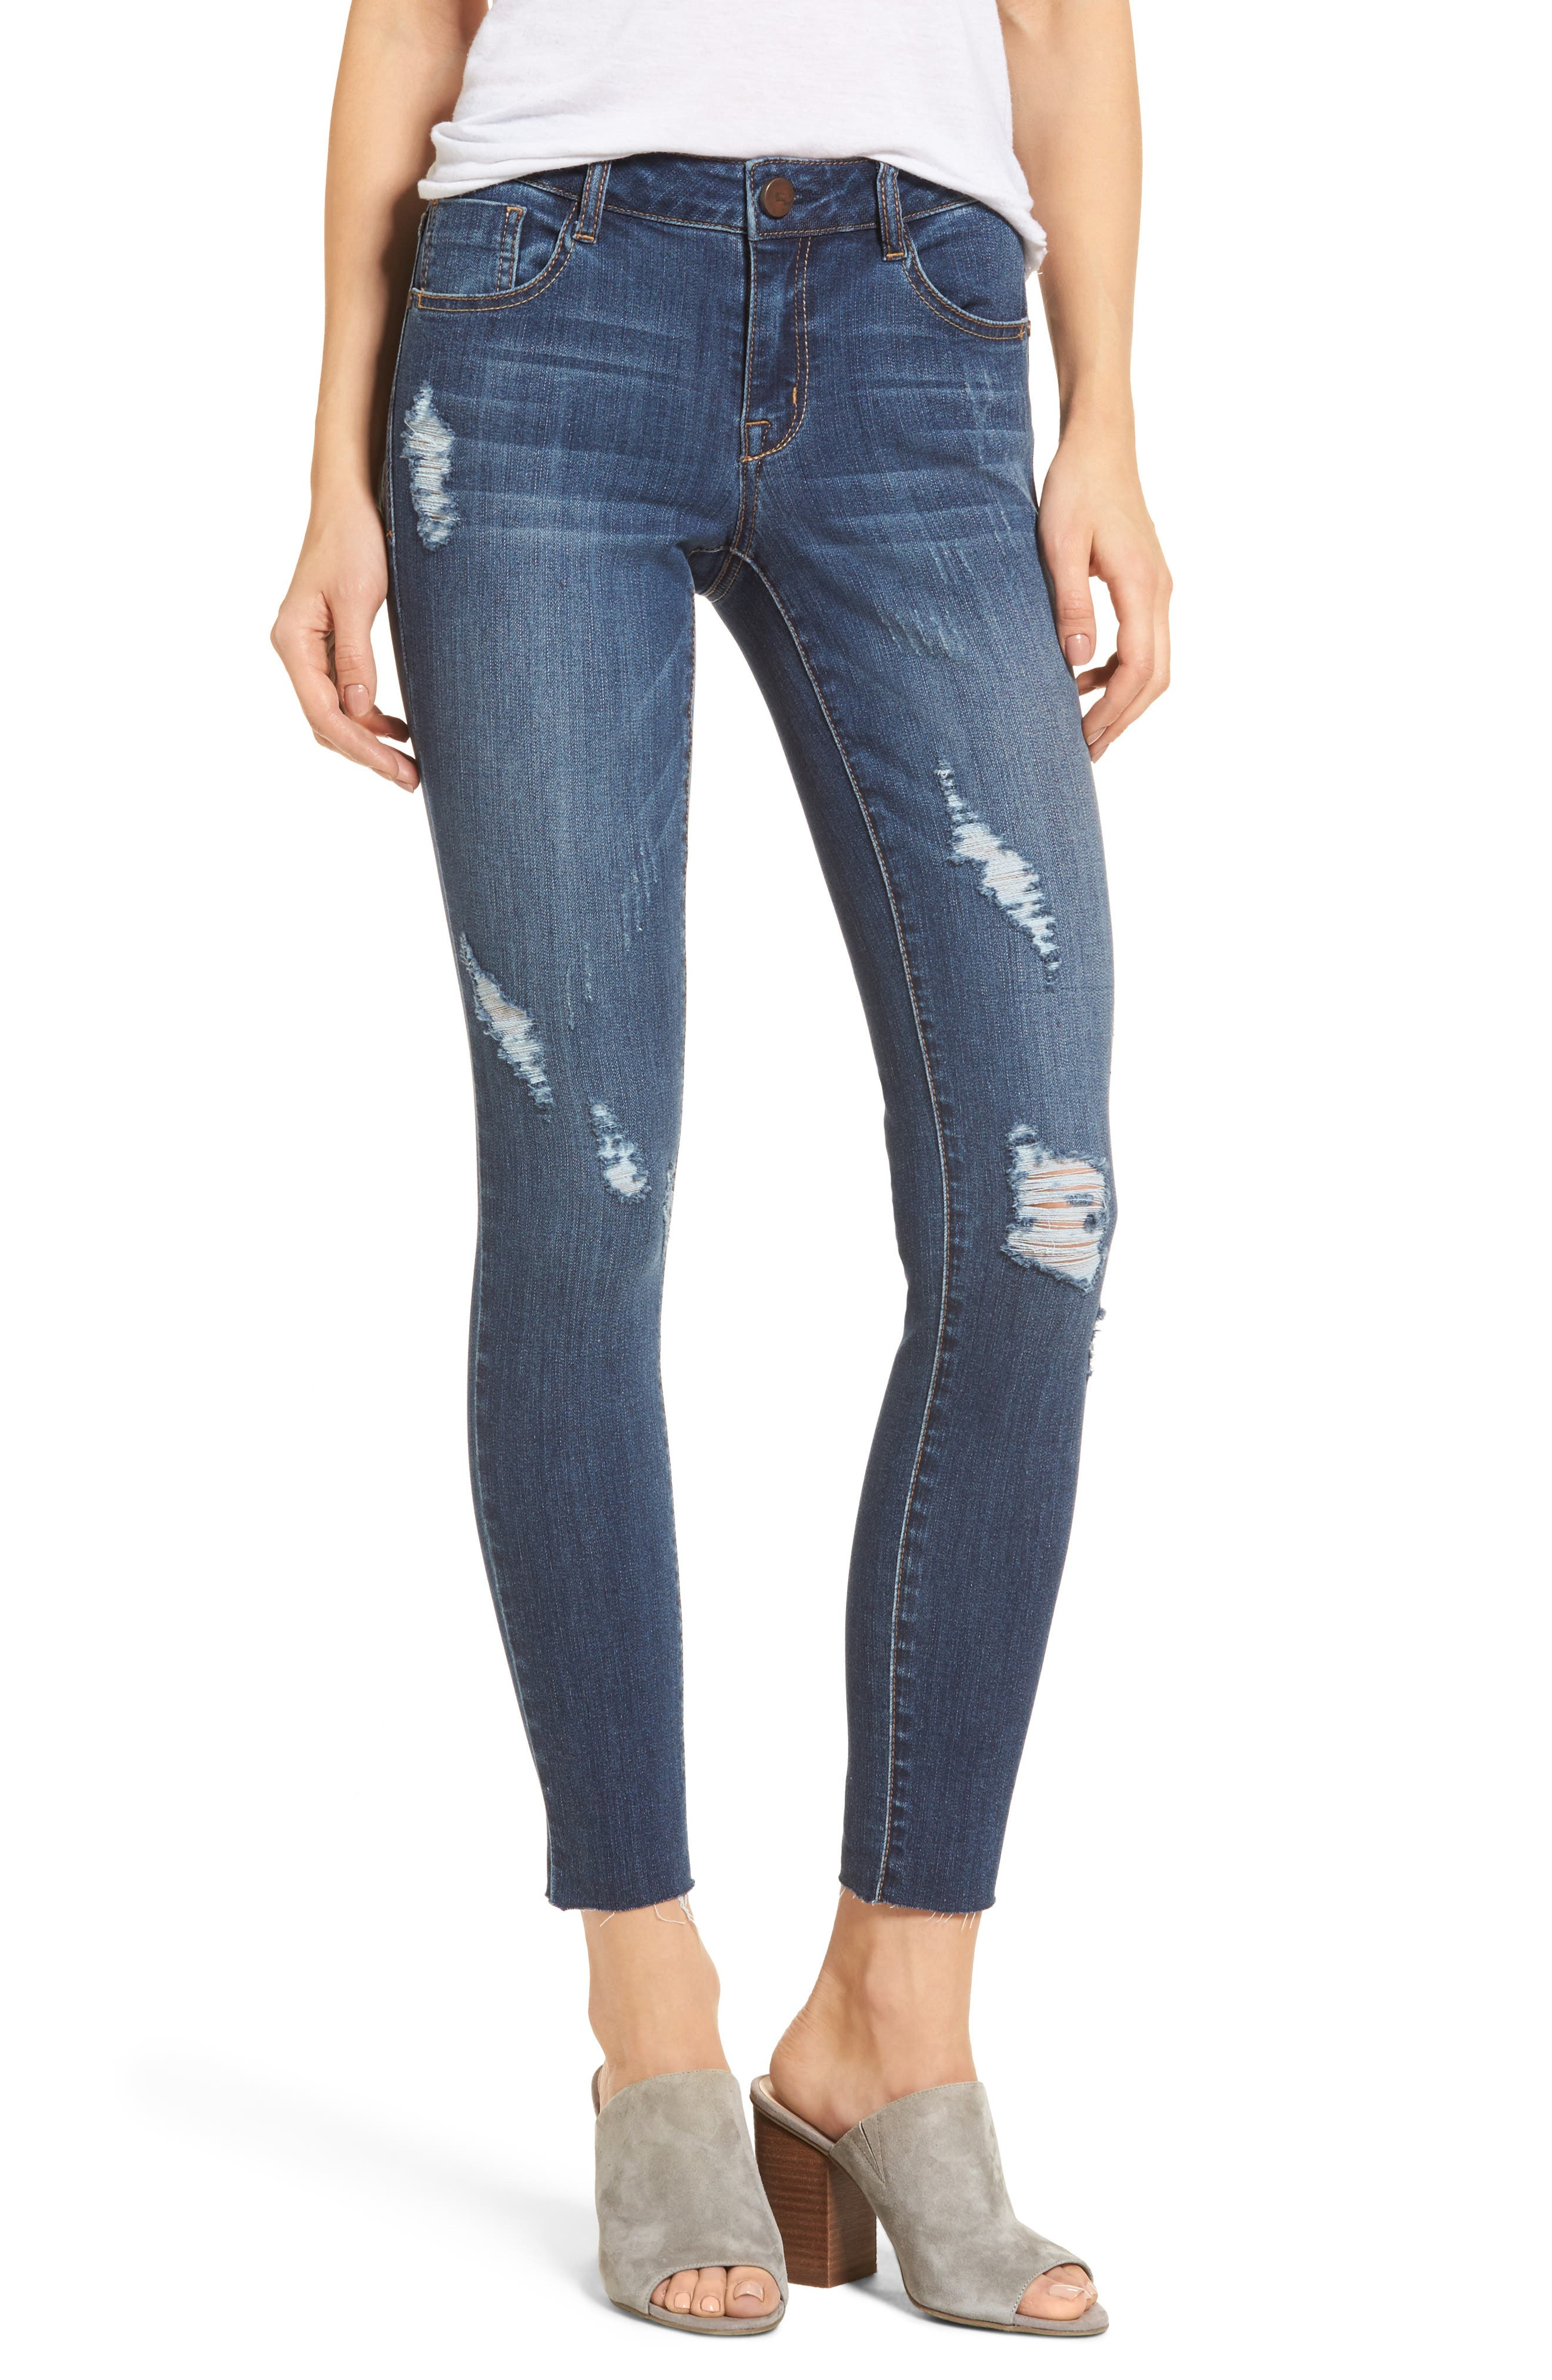 Main Image - 1822 Denim Decon Distressed Skinny Jeans (Wall Flowers)